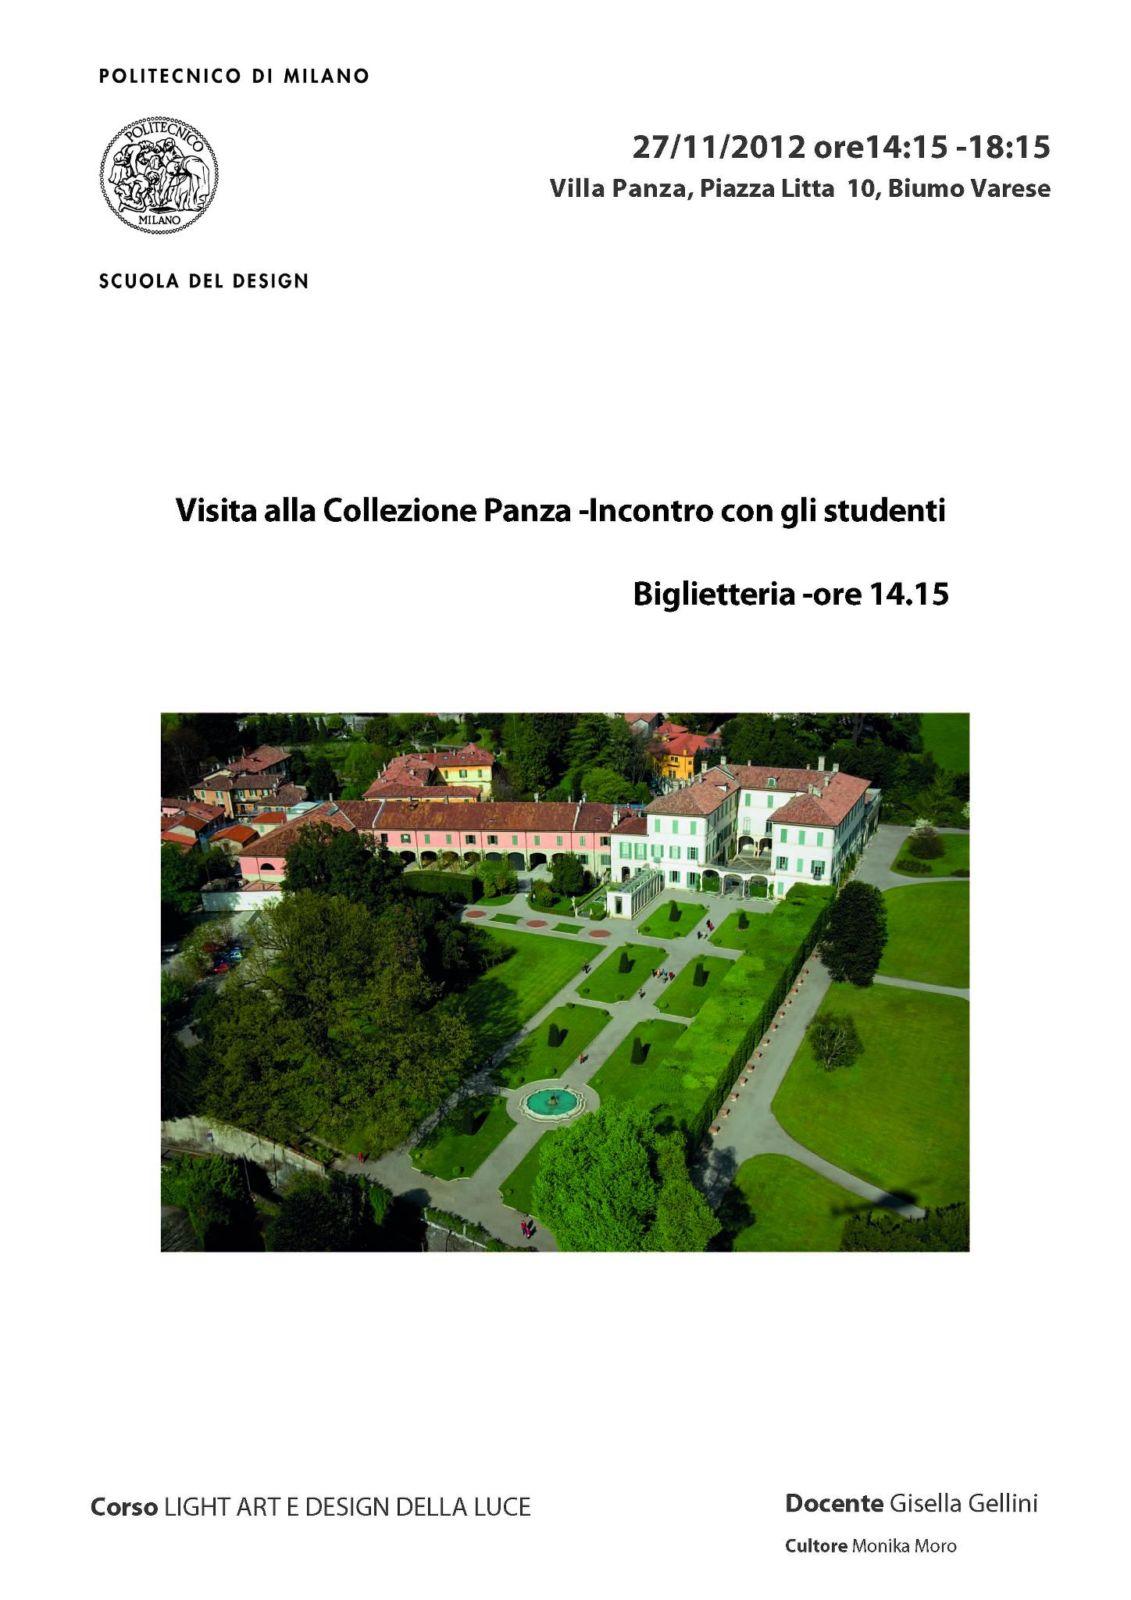 locandina-villa-panza